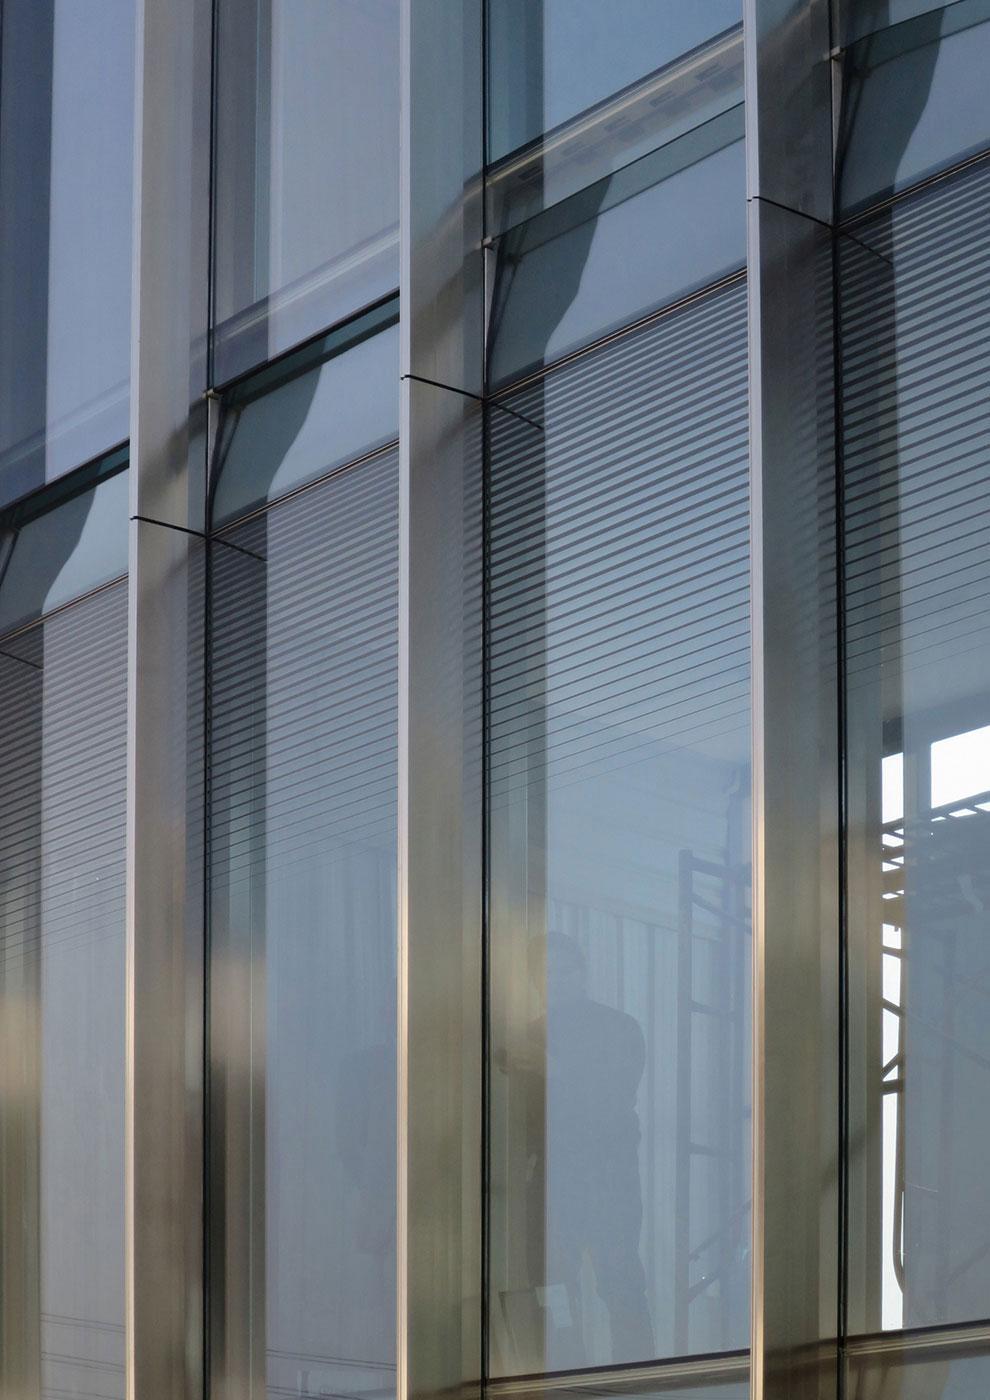 Facade Close Up View Jaeger Kahlen Partners Architects Ltd.